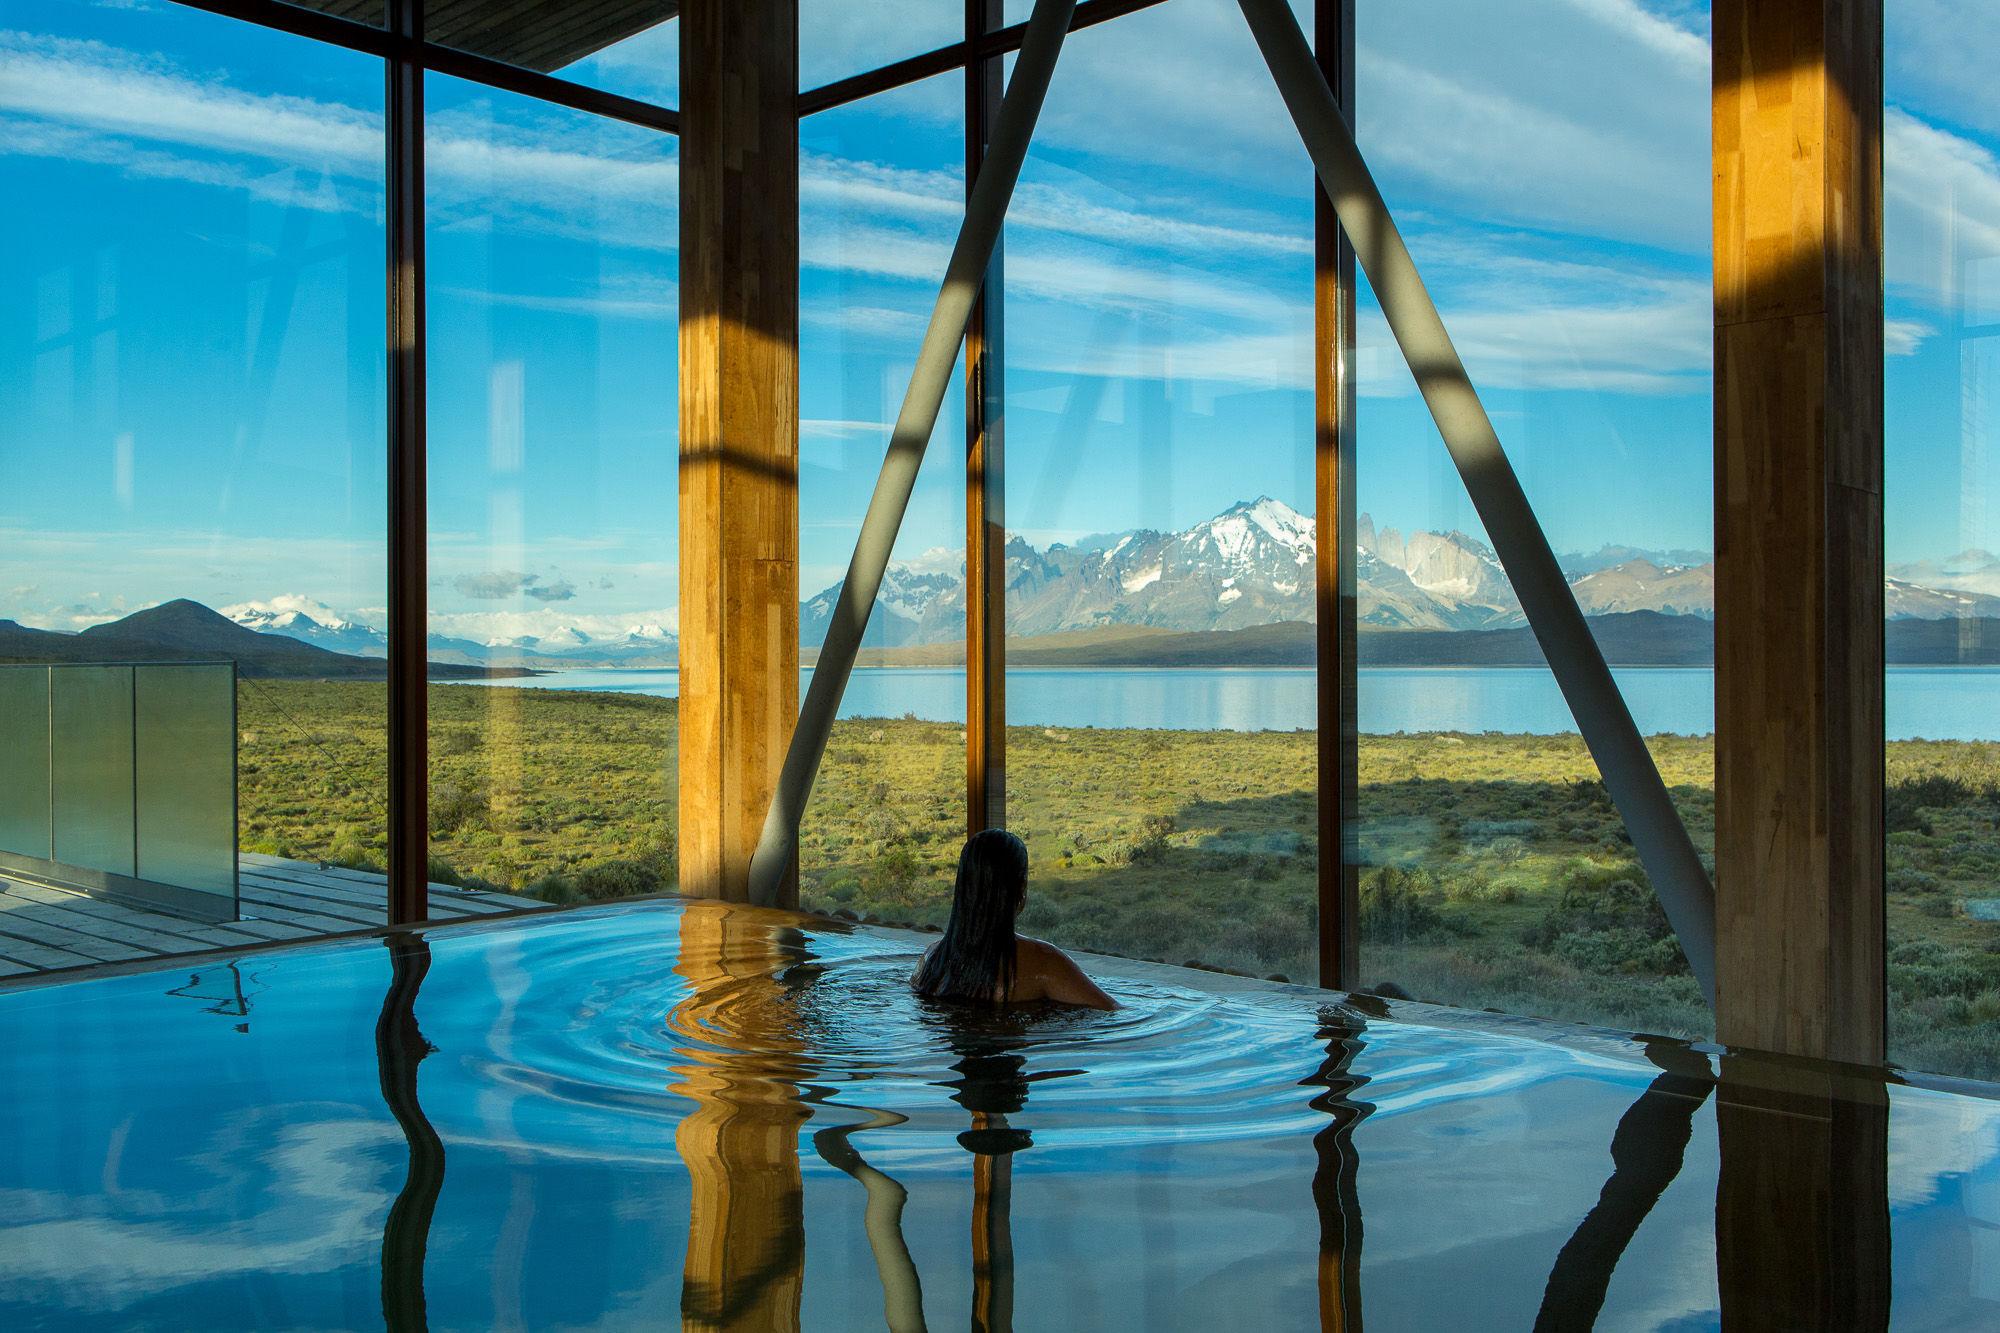 Sfeerimpressie Rondreis Chili: Chili in Luxe